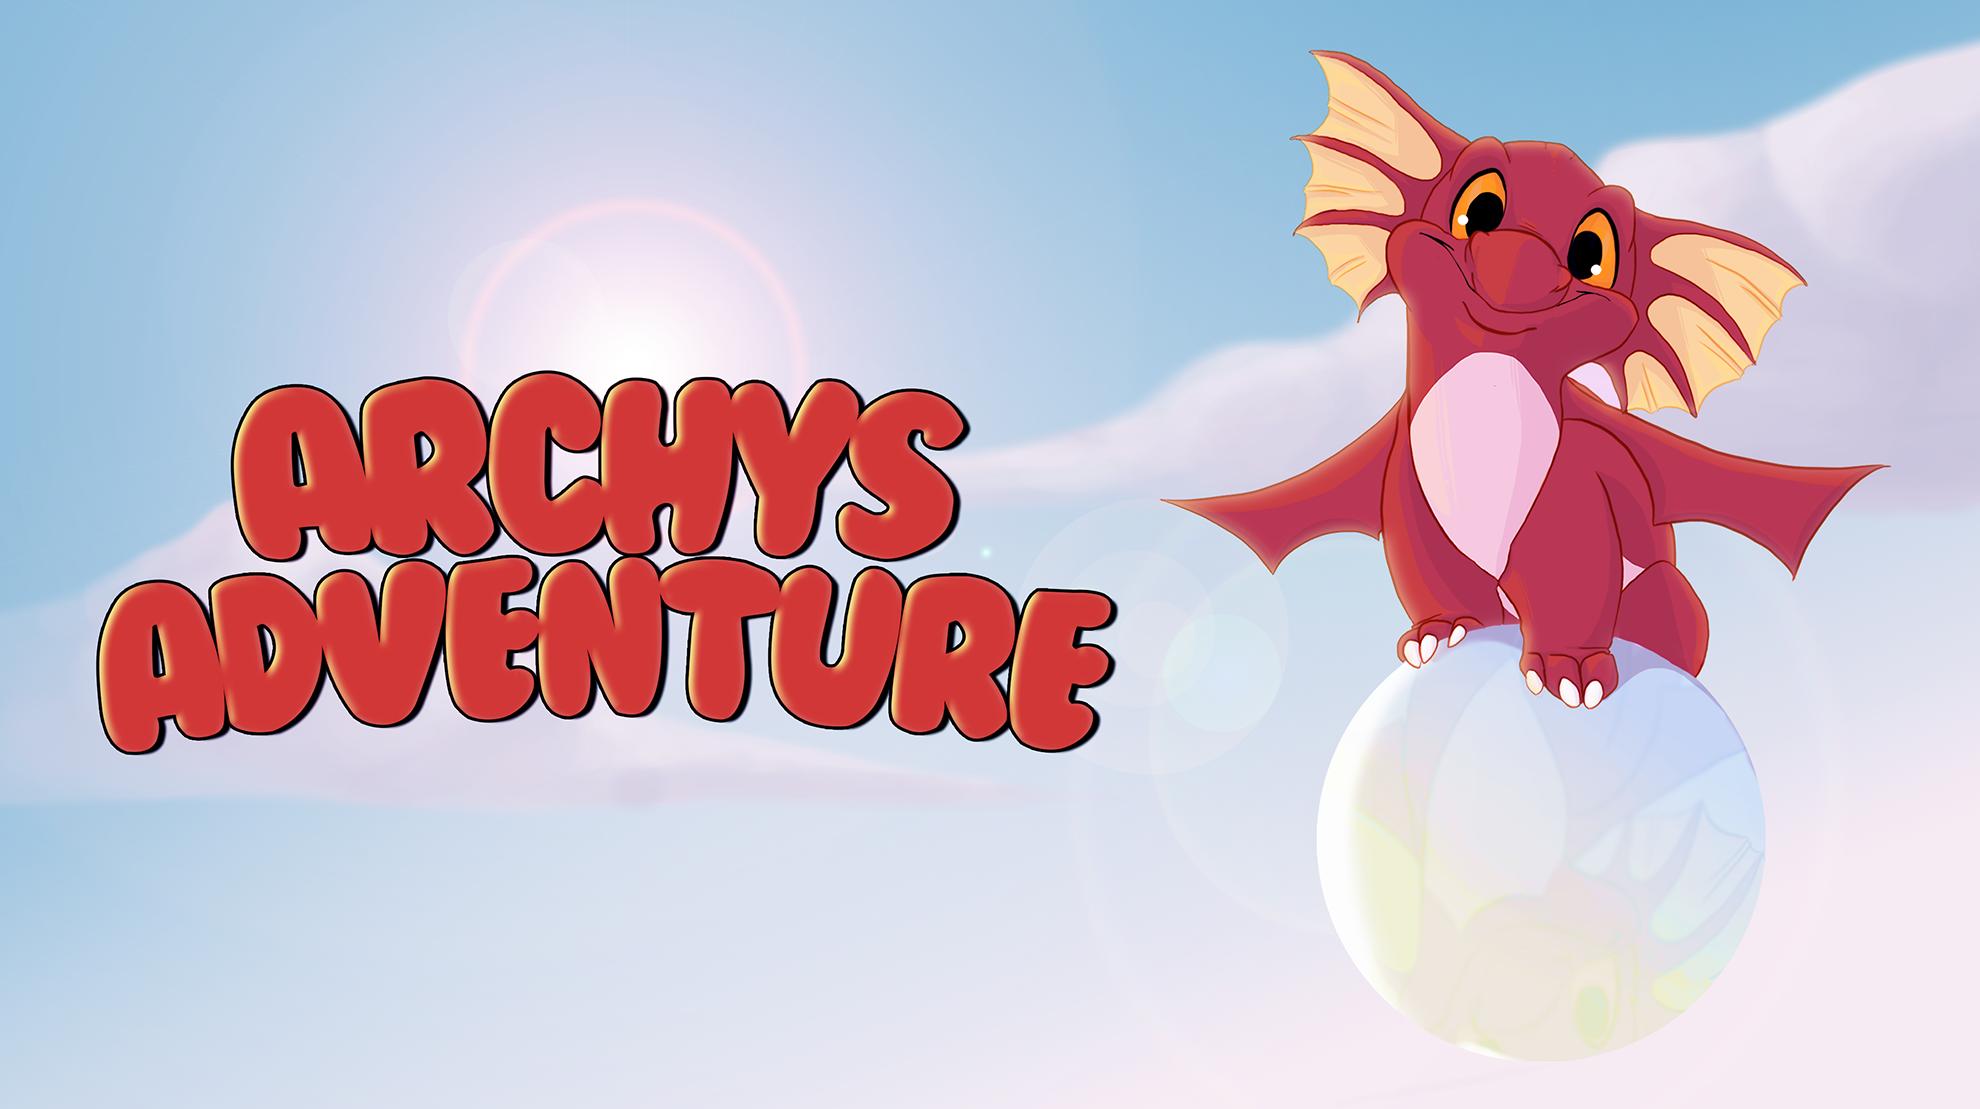 Archy's Adventure